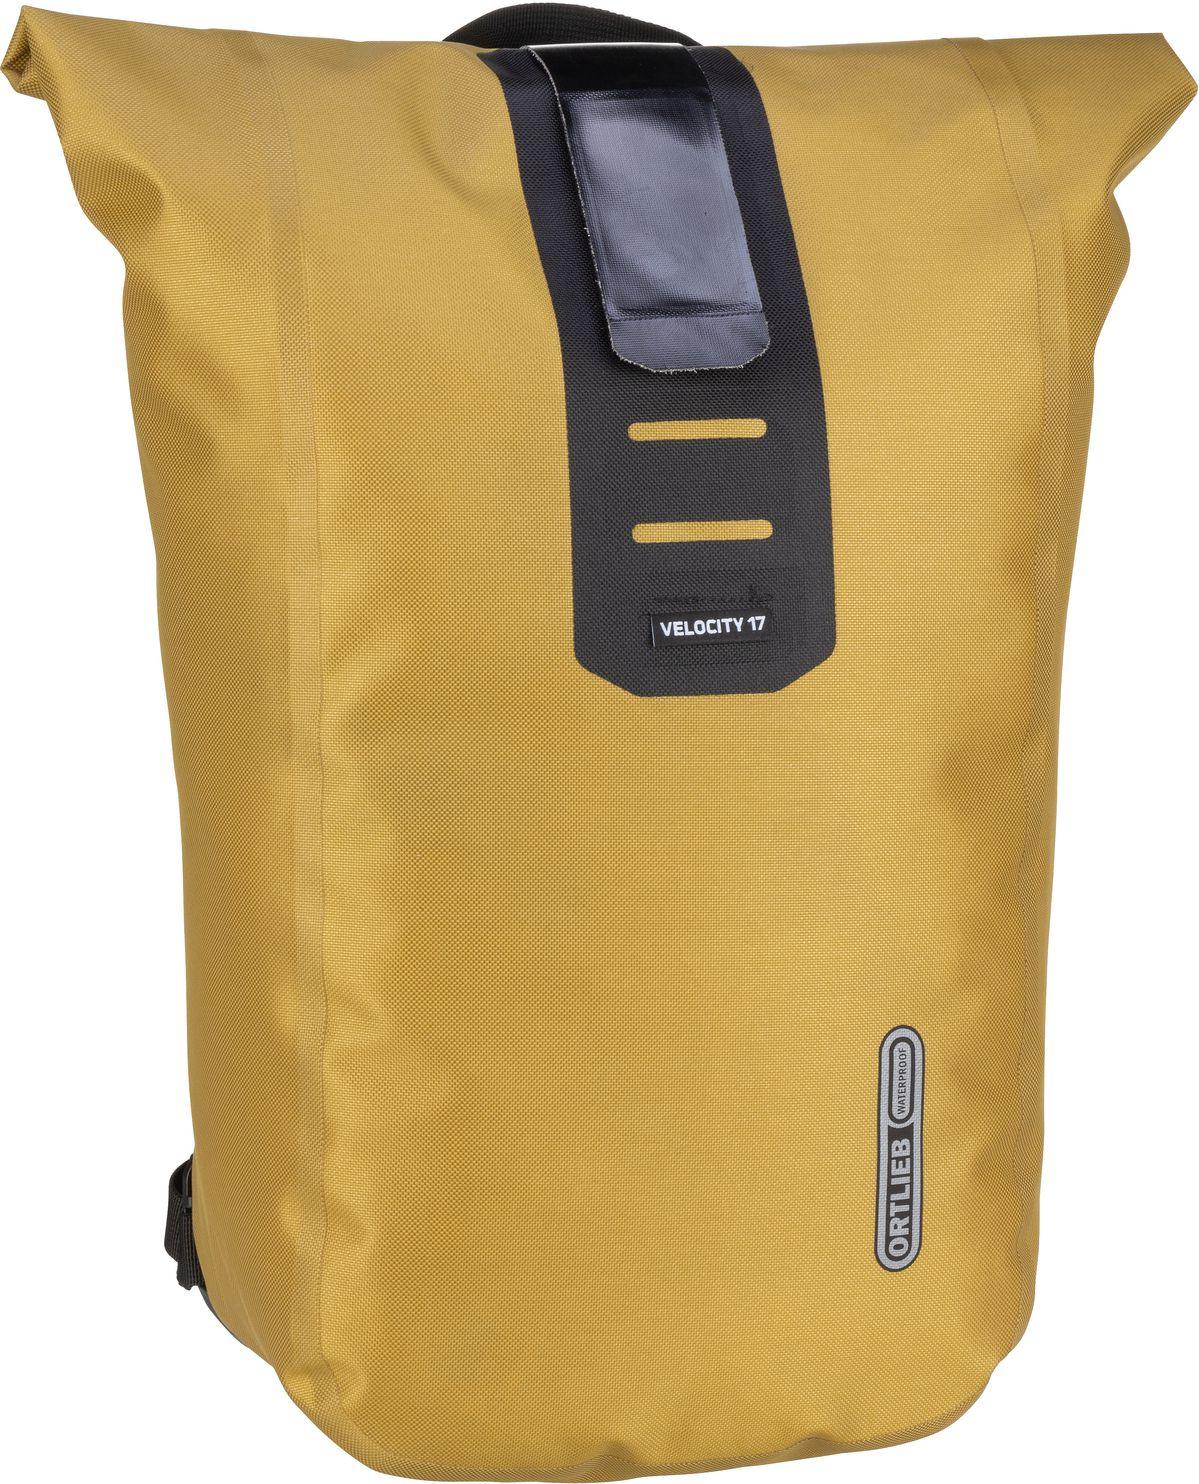 Rucksack / Daypack Velocity PS 17L Mustard (17 Liter)